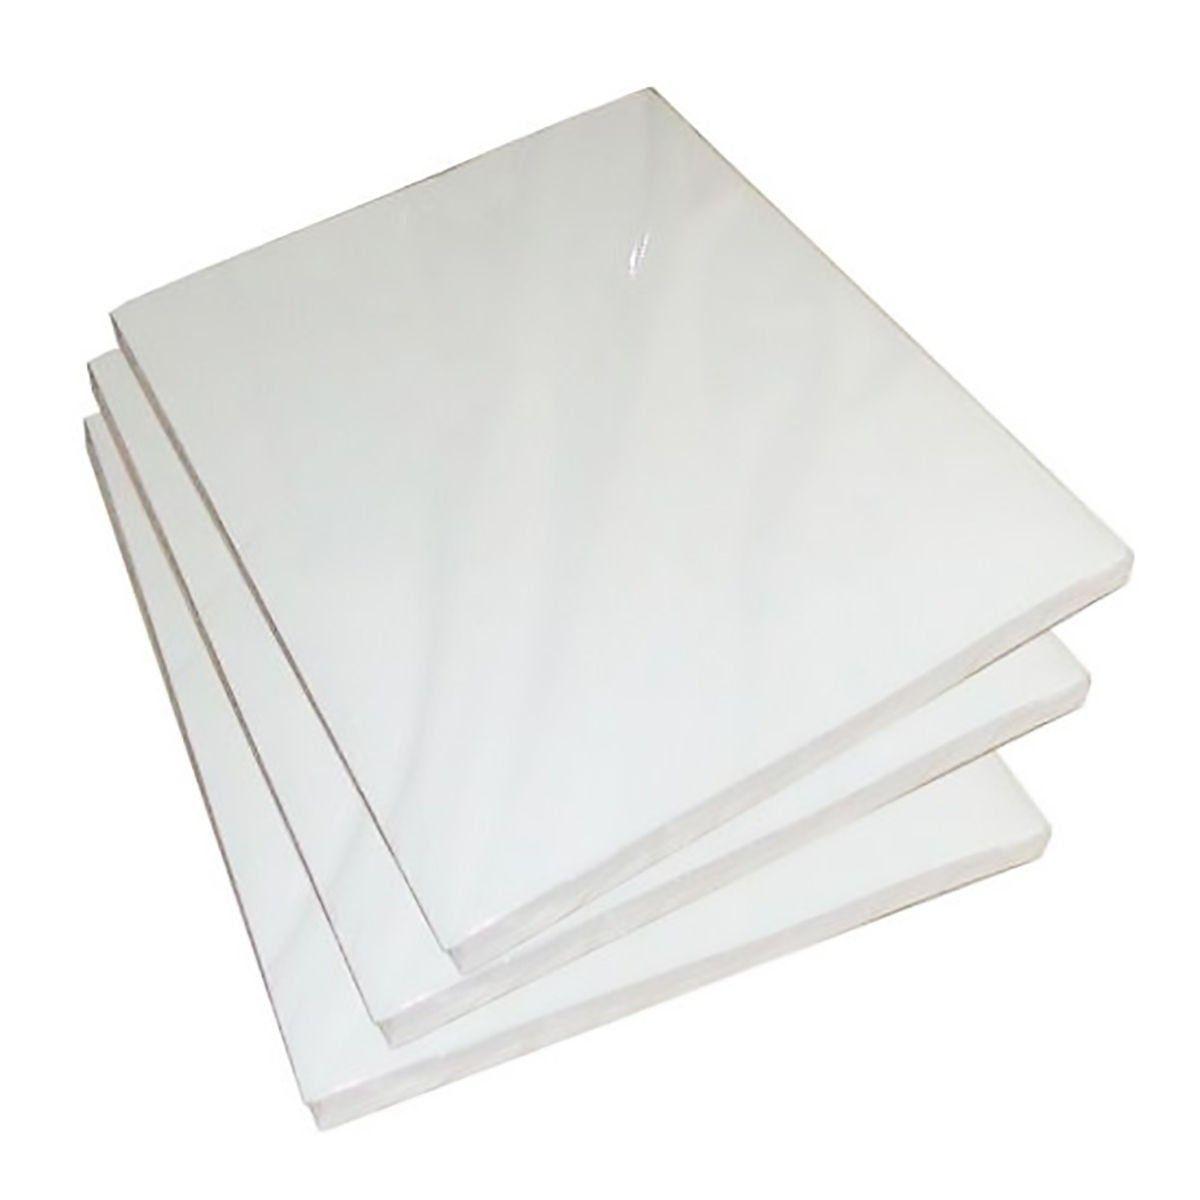 Papel Fotográfico A4 Dupla Face 220g Glossy Branco Brilhante Resistente à Água / 20 folhas